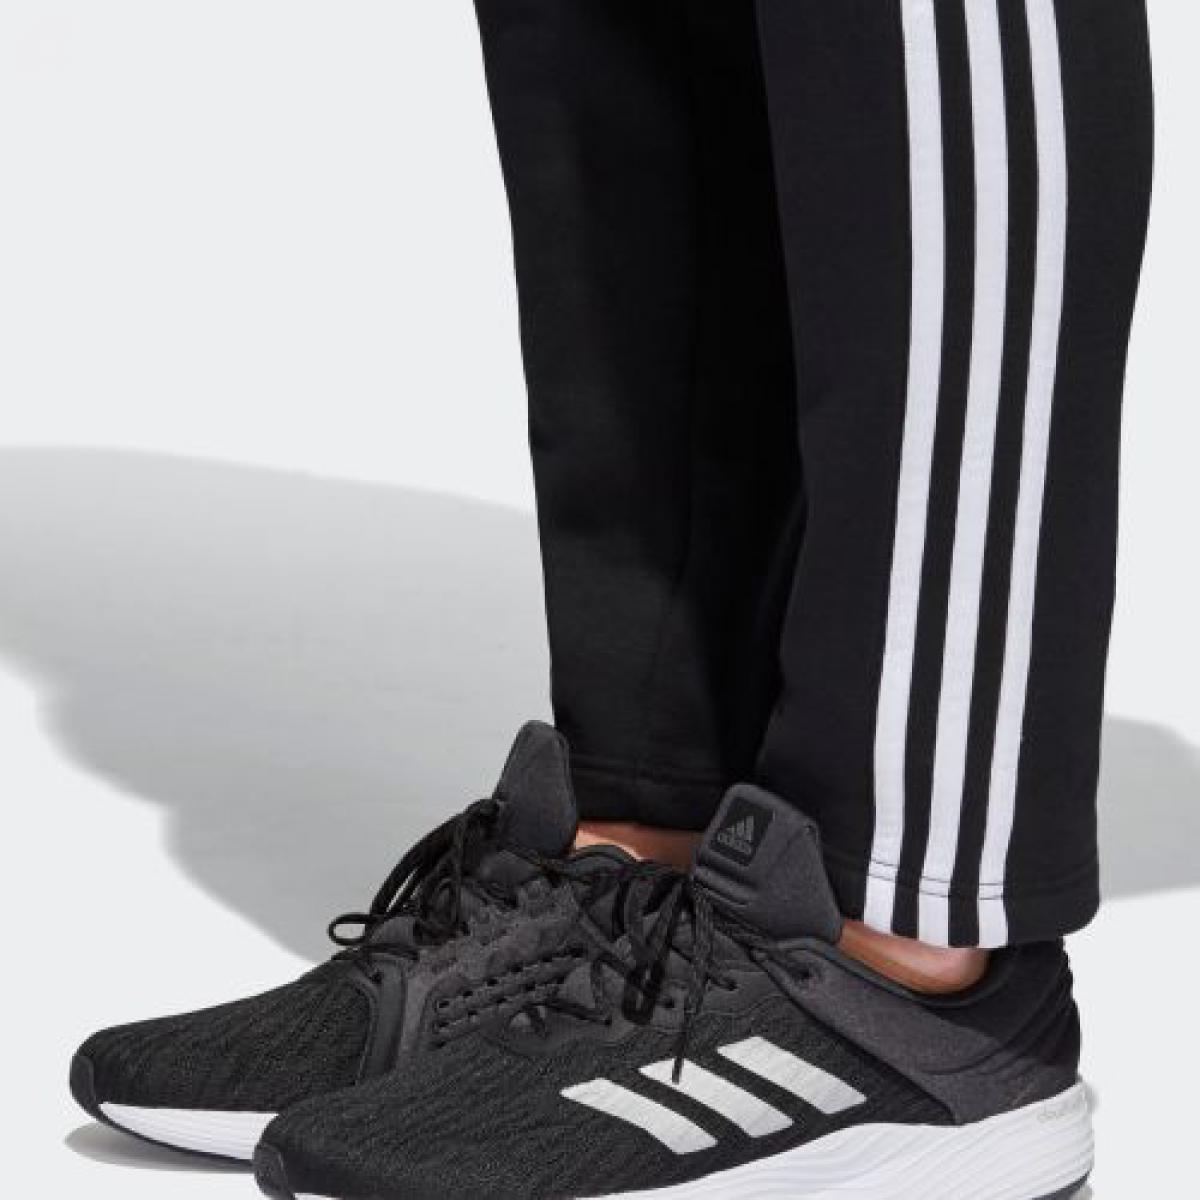 Adidas adidas M ESSENTIALS 3 stripe sweat shirt tapered pants (back raising) men's wear bottoms underwear, sweat shirt CZ7414